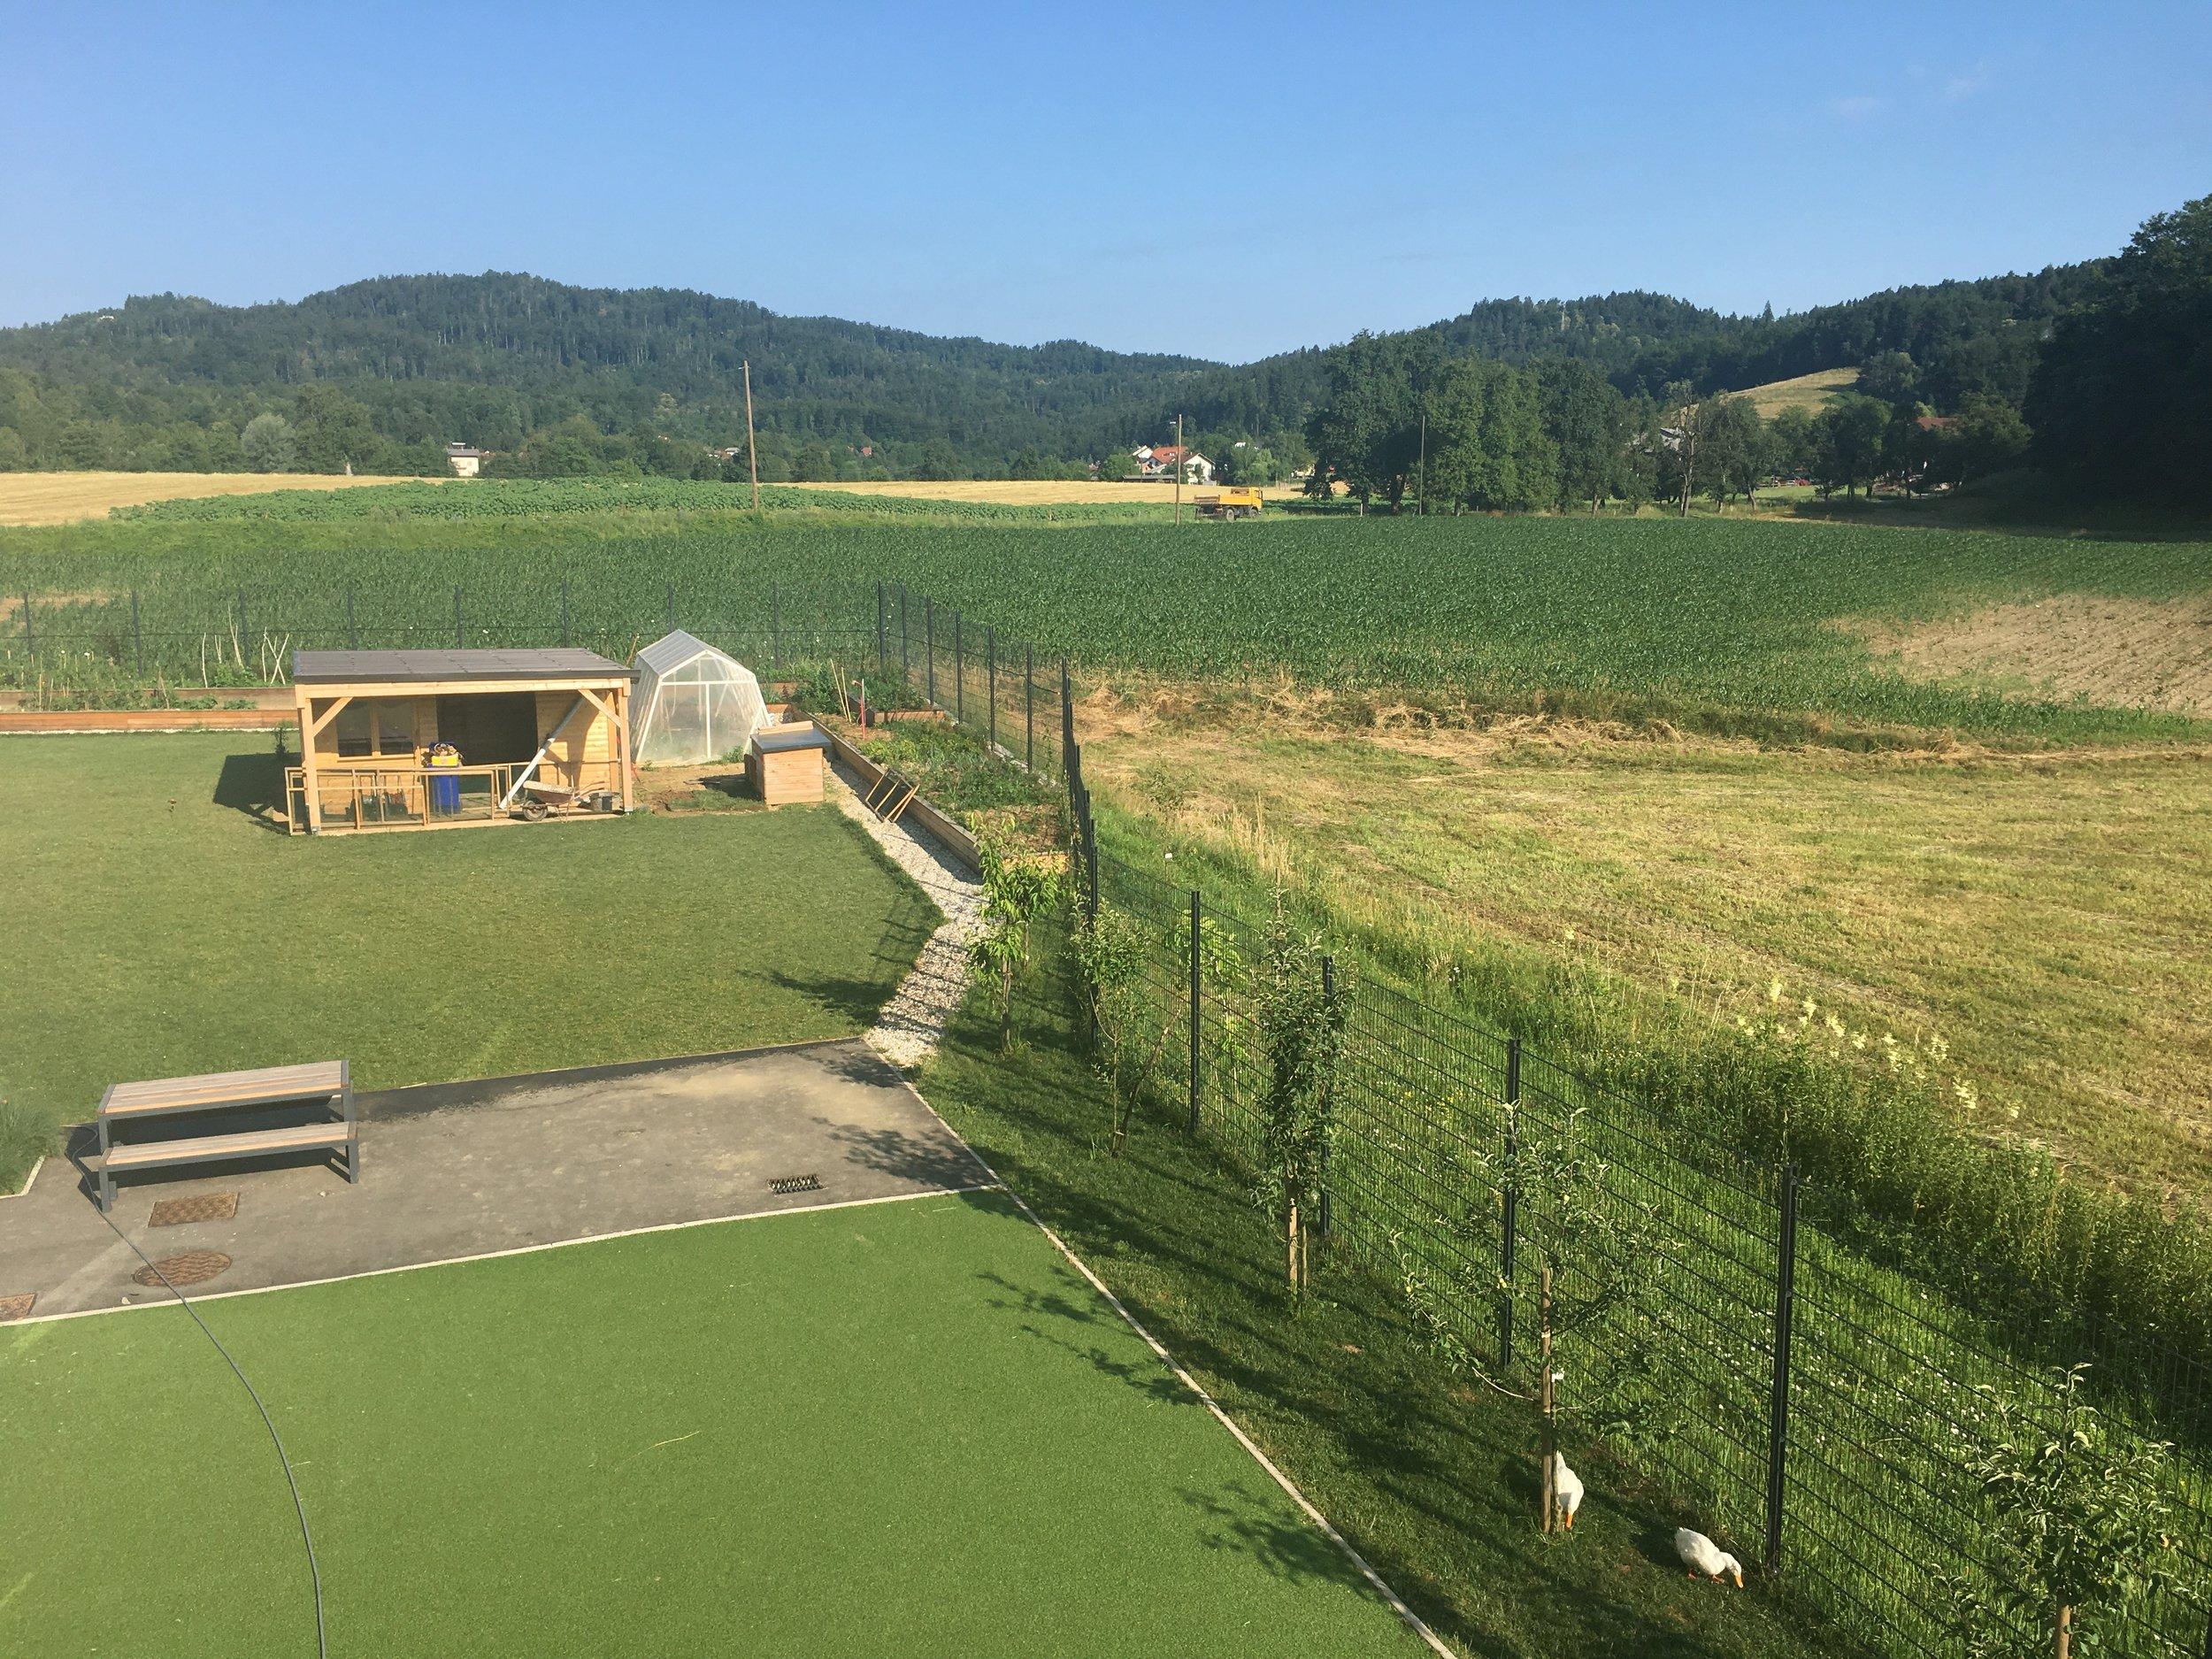 Play area and farm land